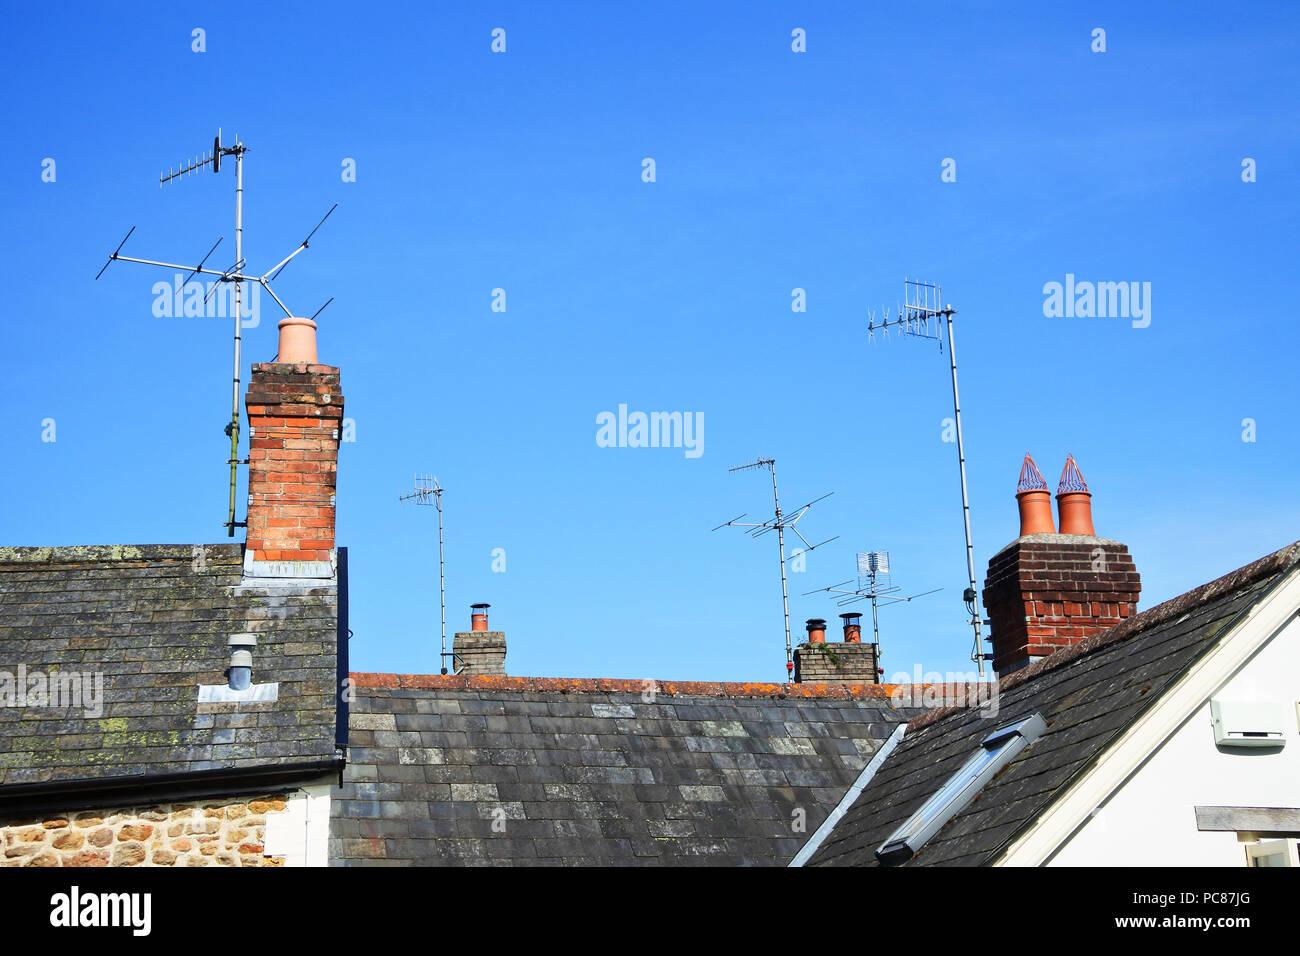 Multiple TV aerials on British rooftops - John Gollop Stock Photo